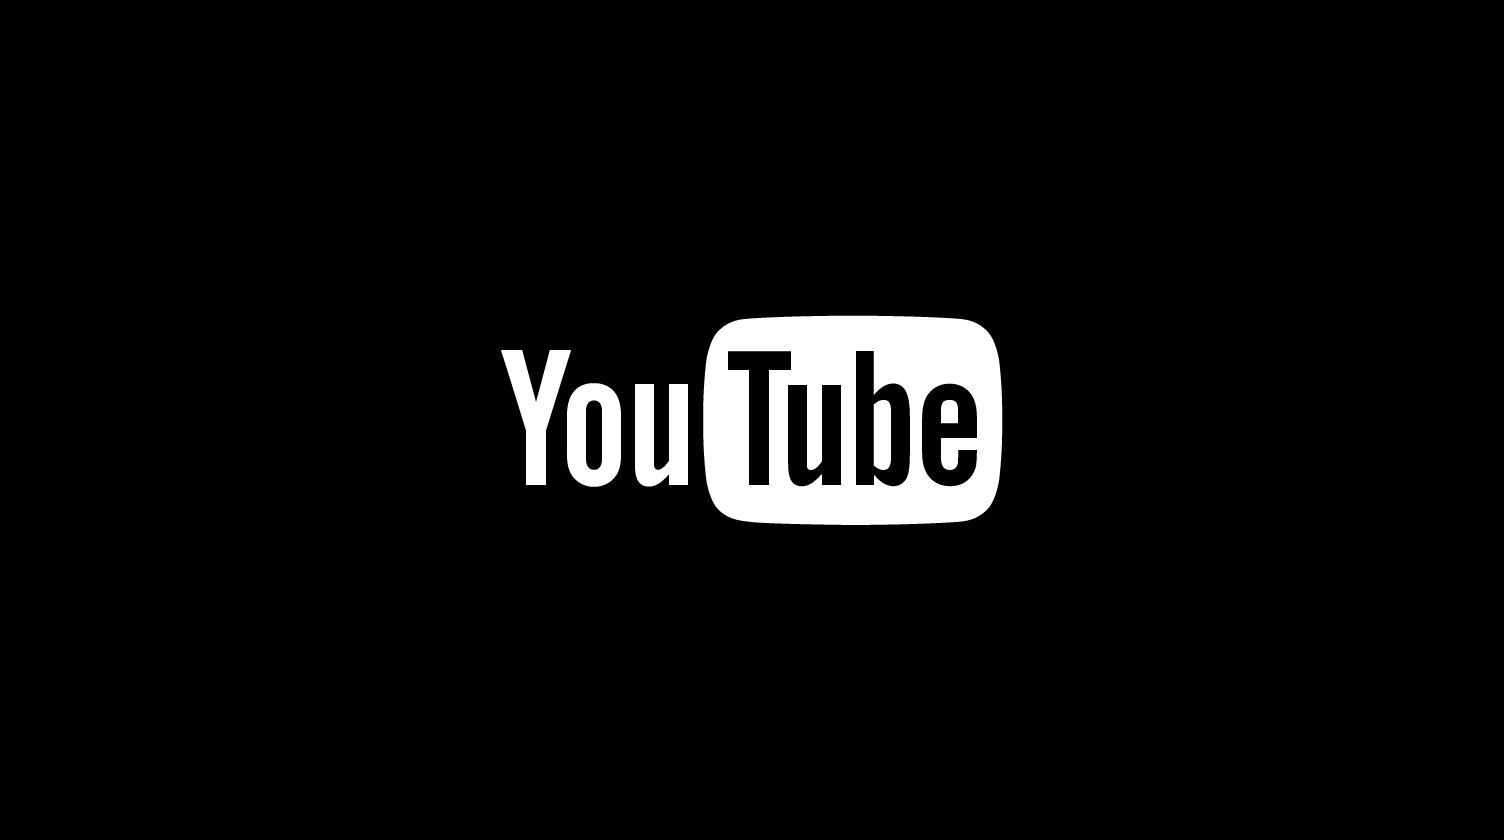 youtube dark logo